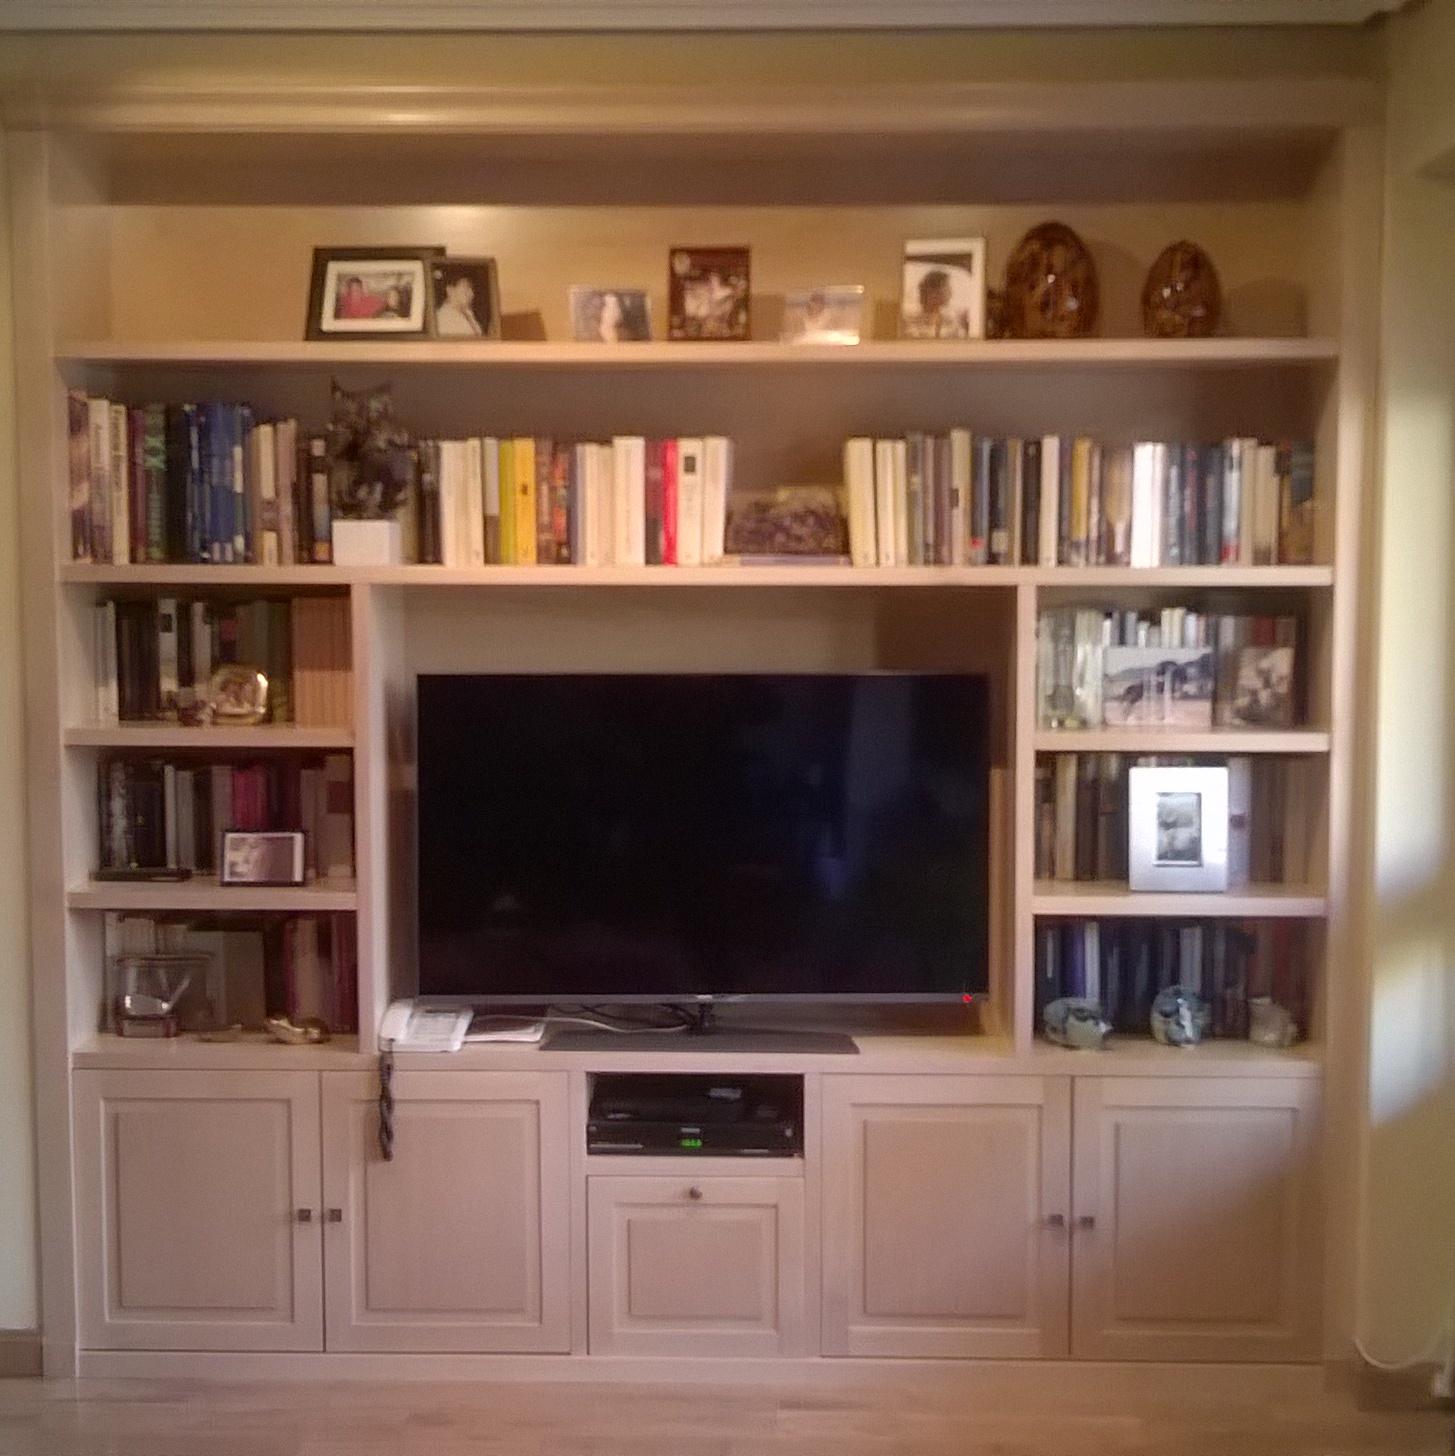 Libreria a medida madrid mueble libreria 617075183 elcarpinterodemadrid librerias a - Libreria universitaria madrid ...